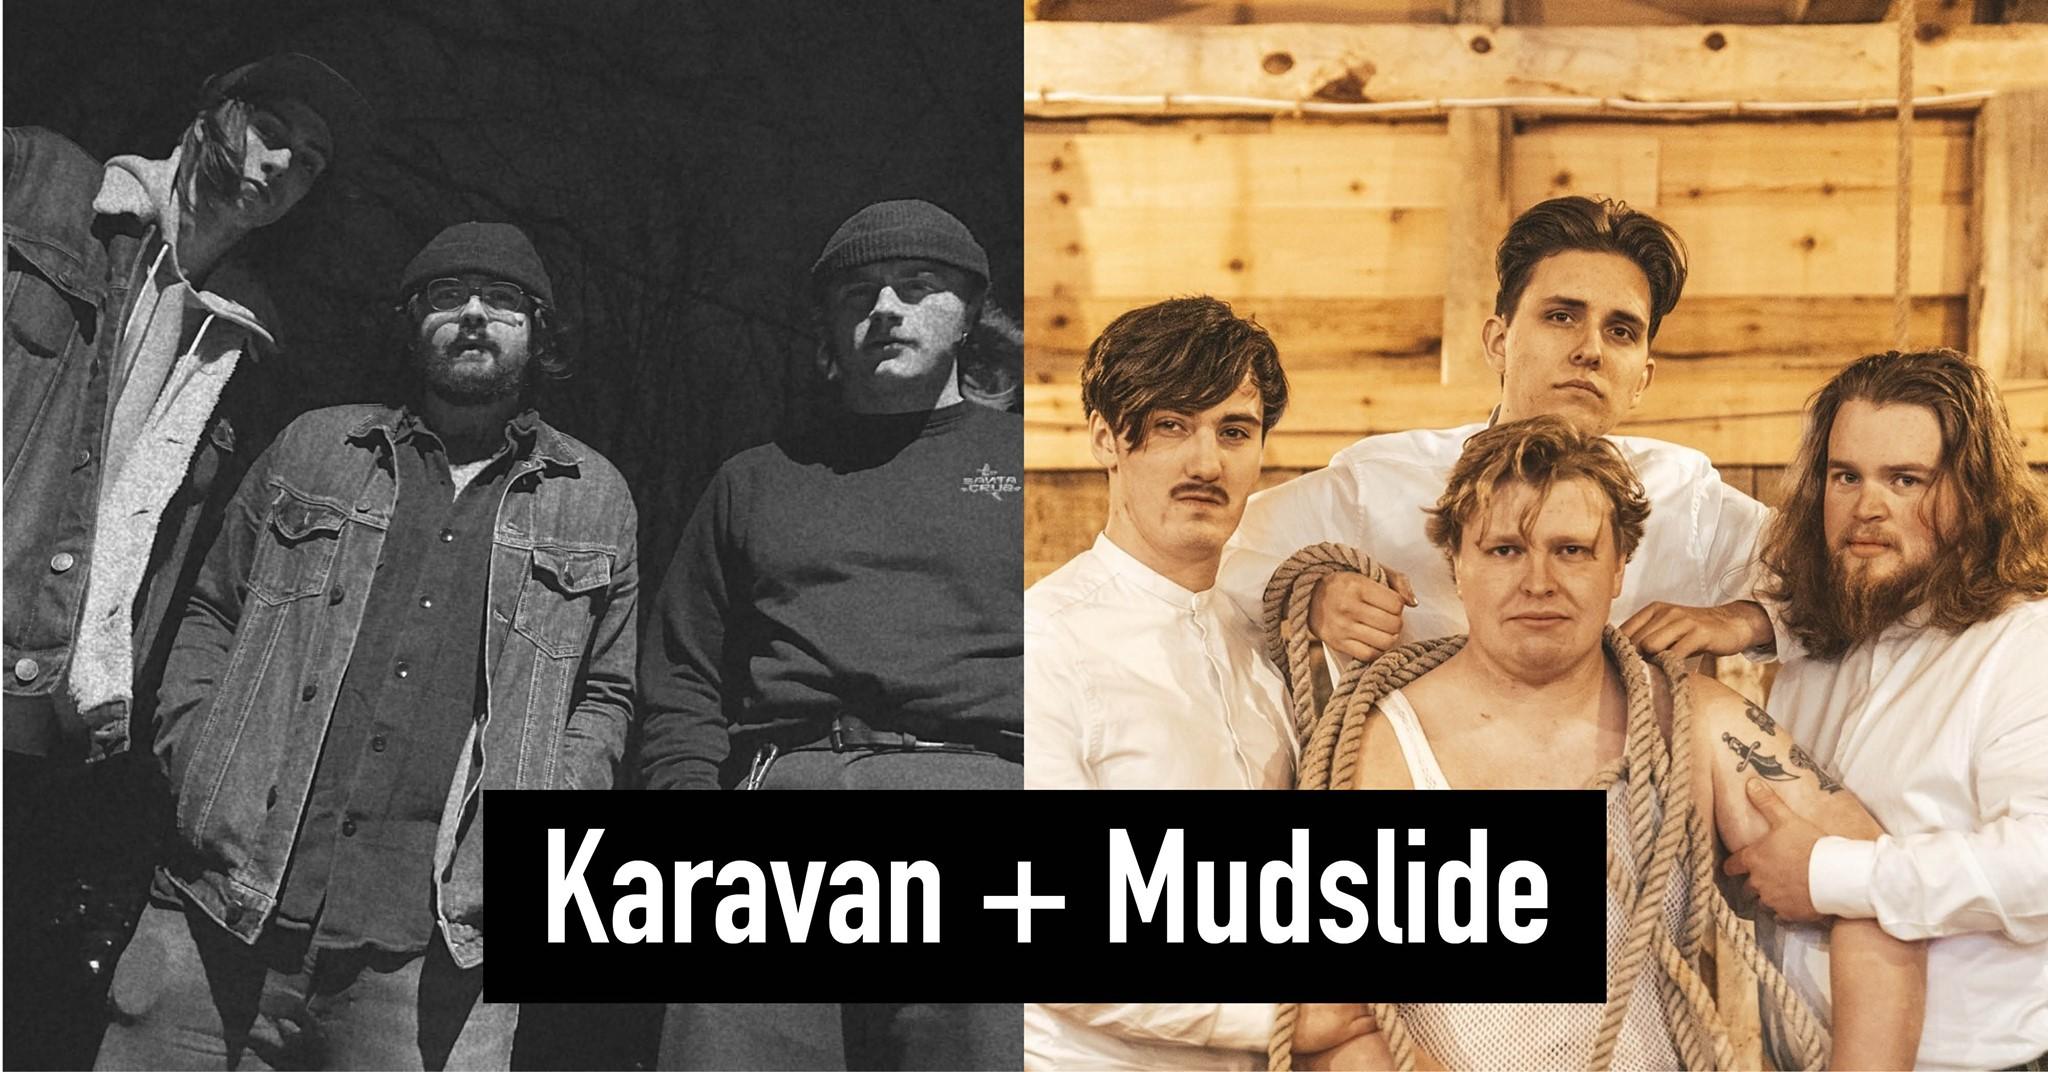 Karavan + Mudslide // Mellombels